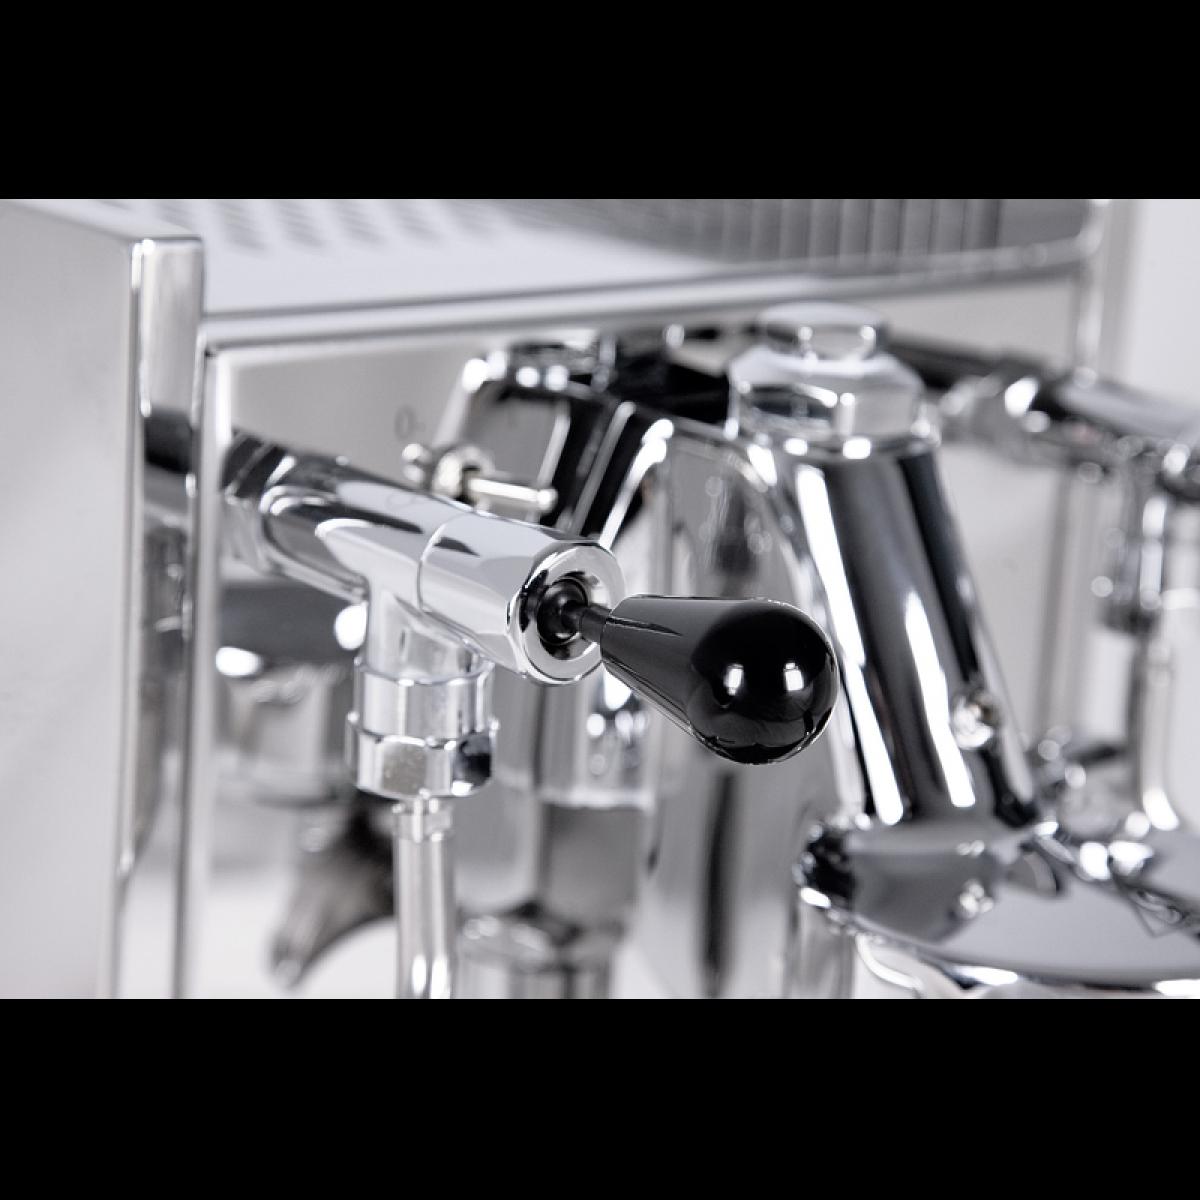 Quickmill RUBINO 0981 Naz Espressomaschine Sonderedition